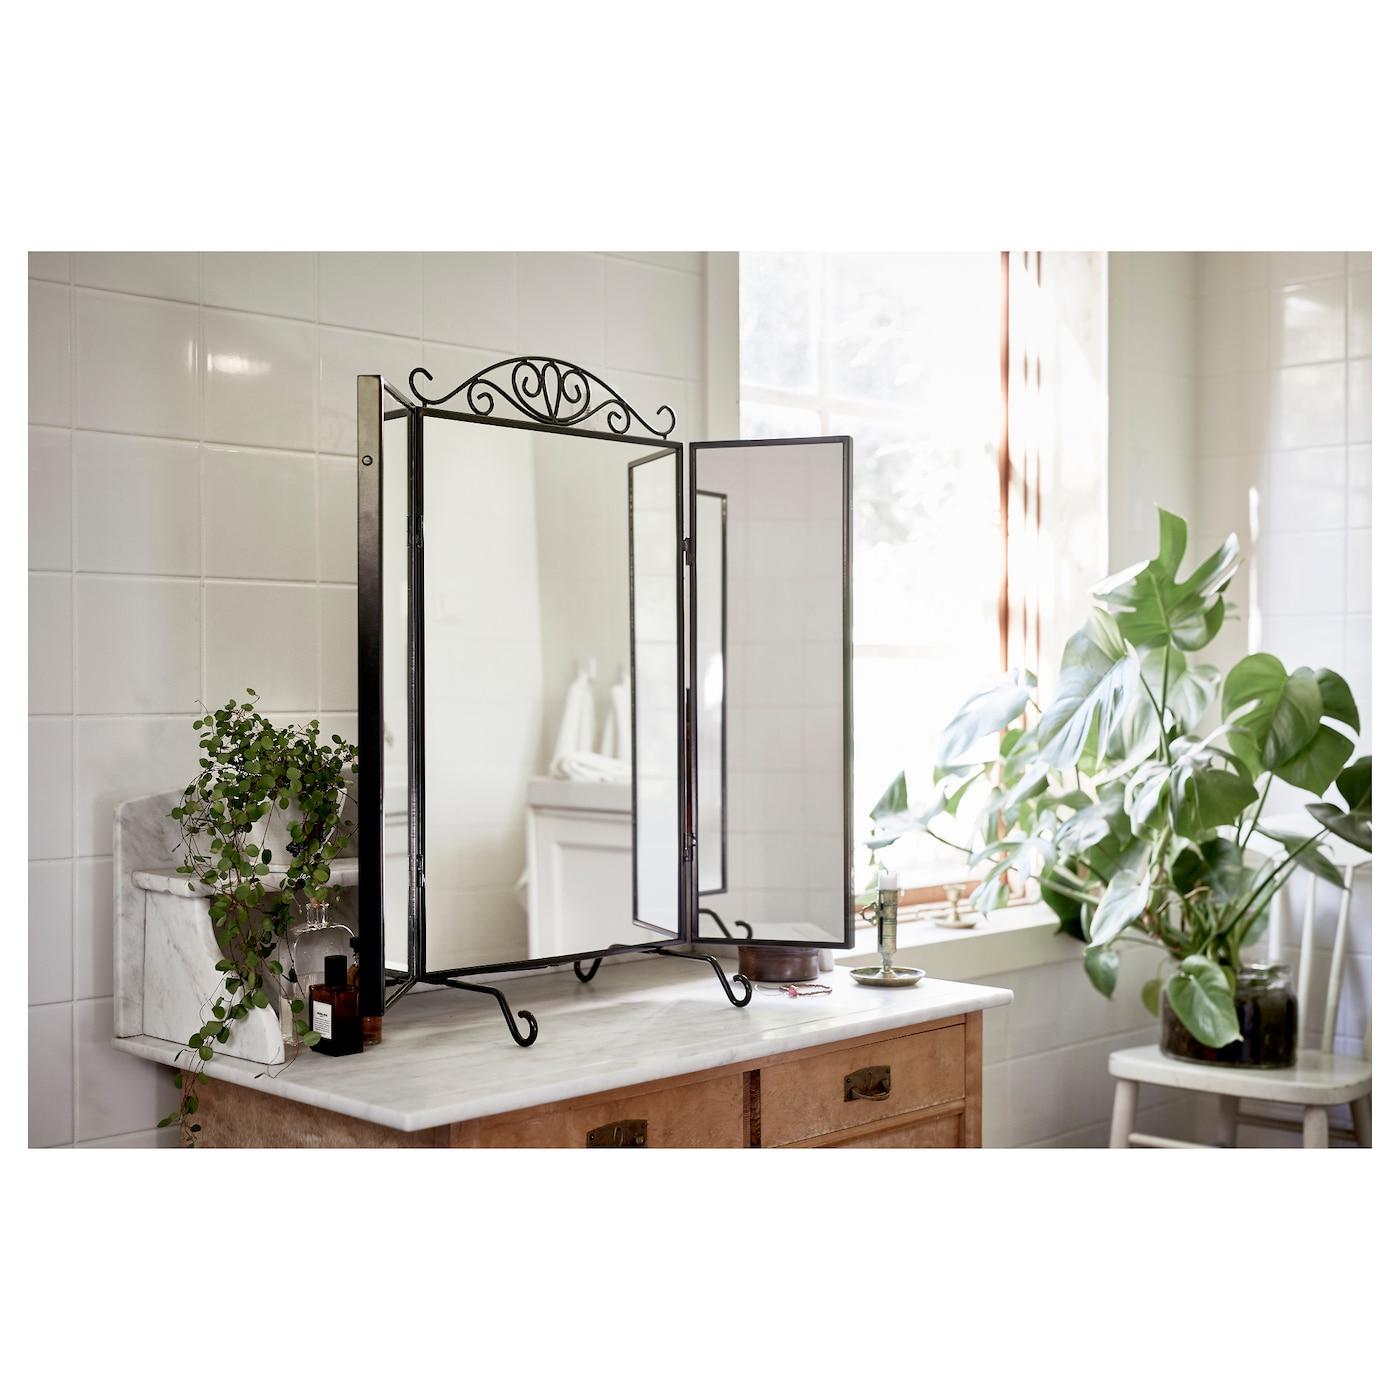 Karmsund Miroir De Table - Noir 80X74 Cm dedans Mobilier De Jardin Ikea